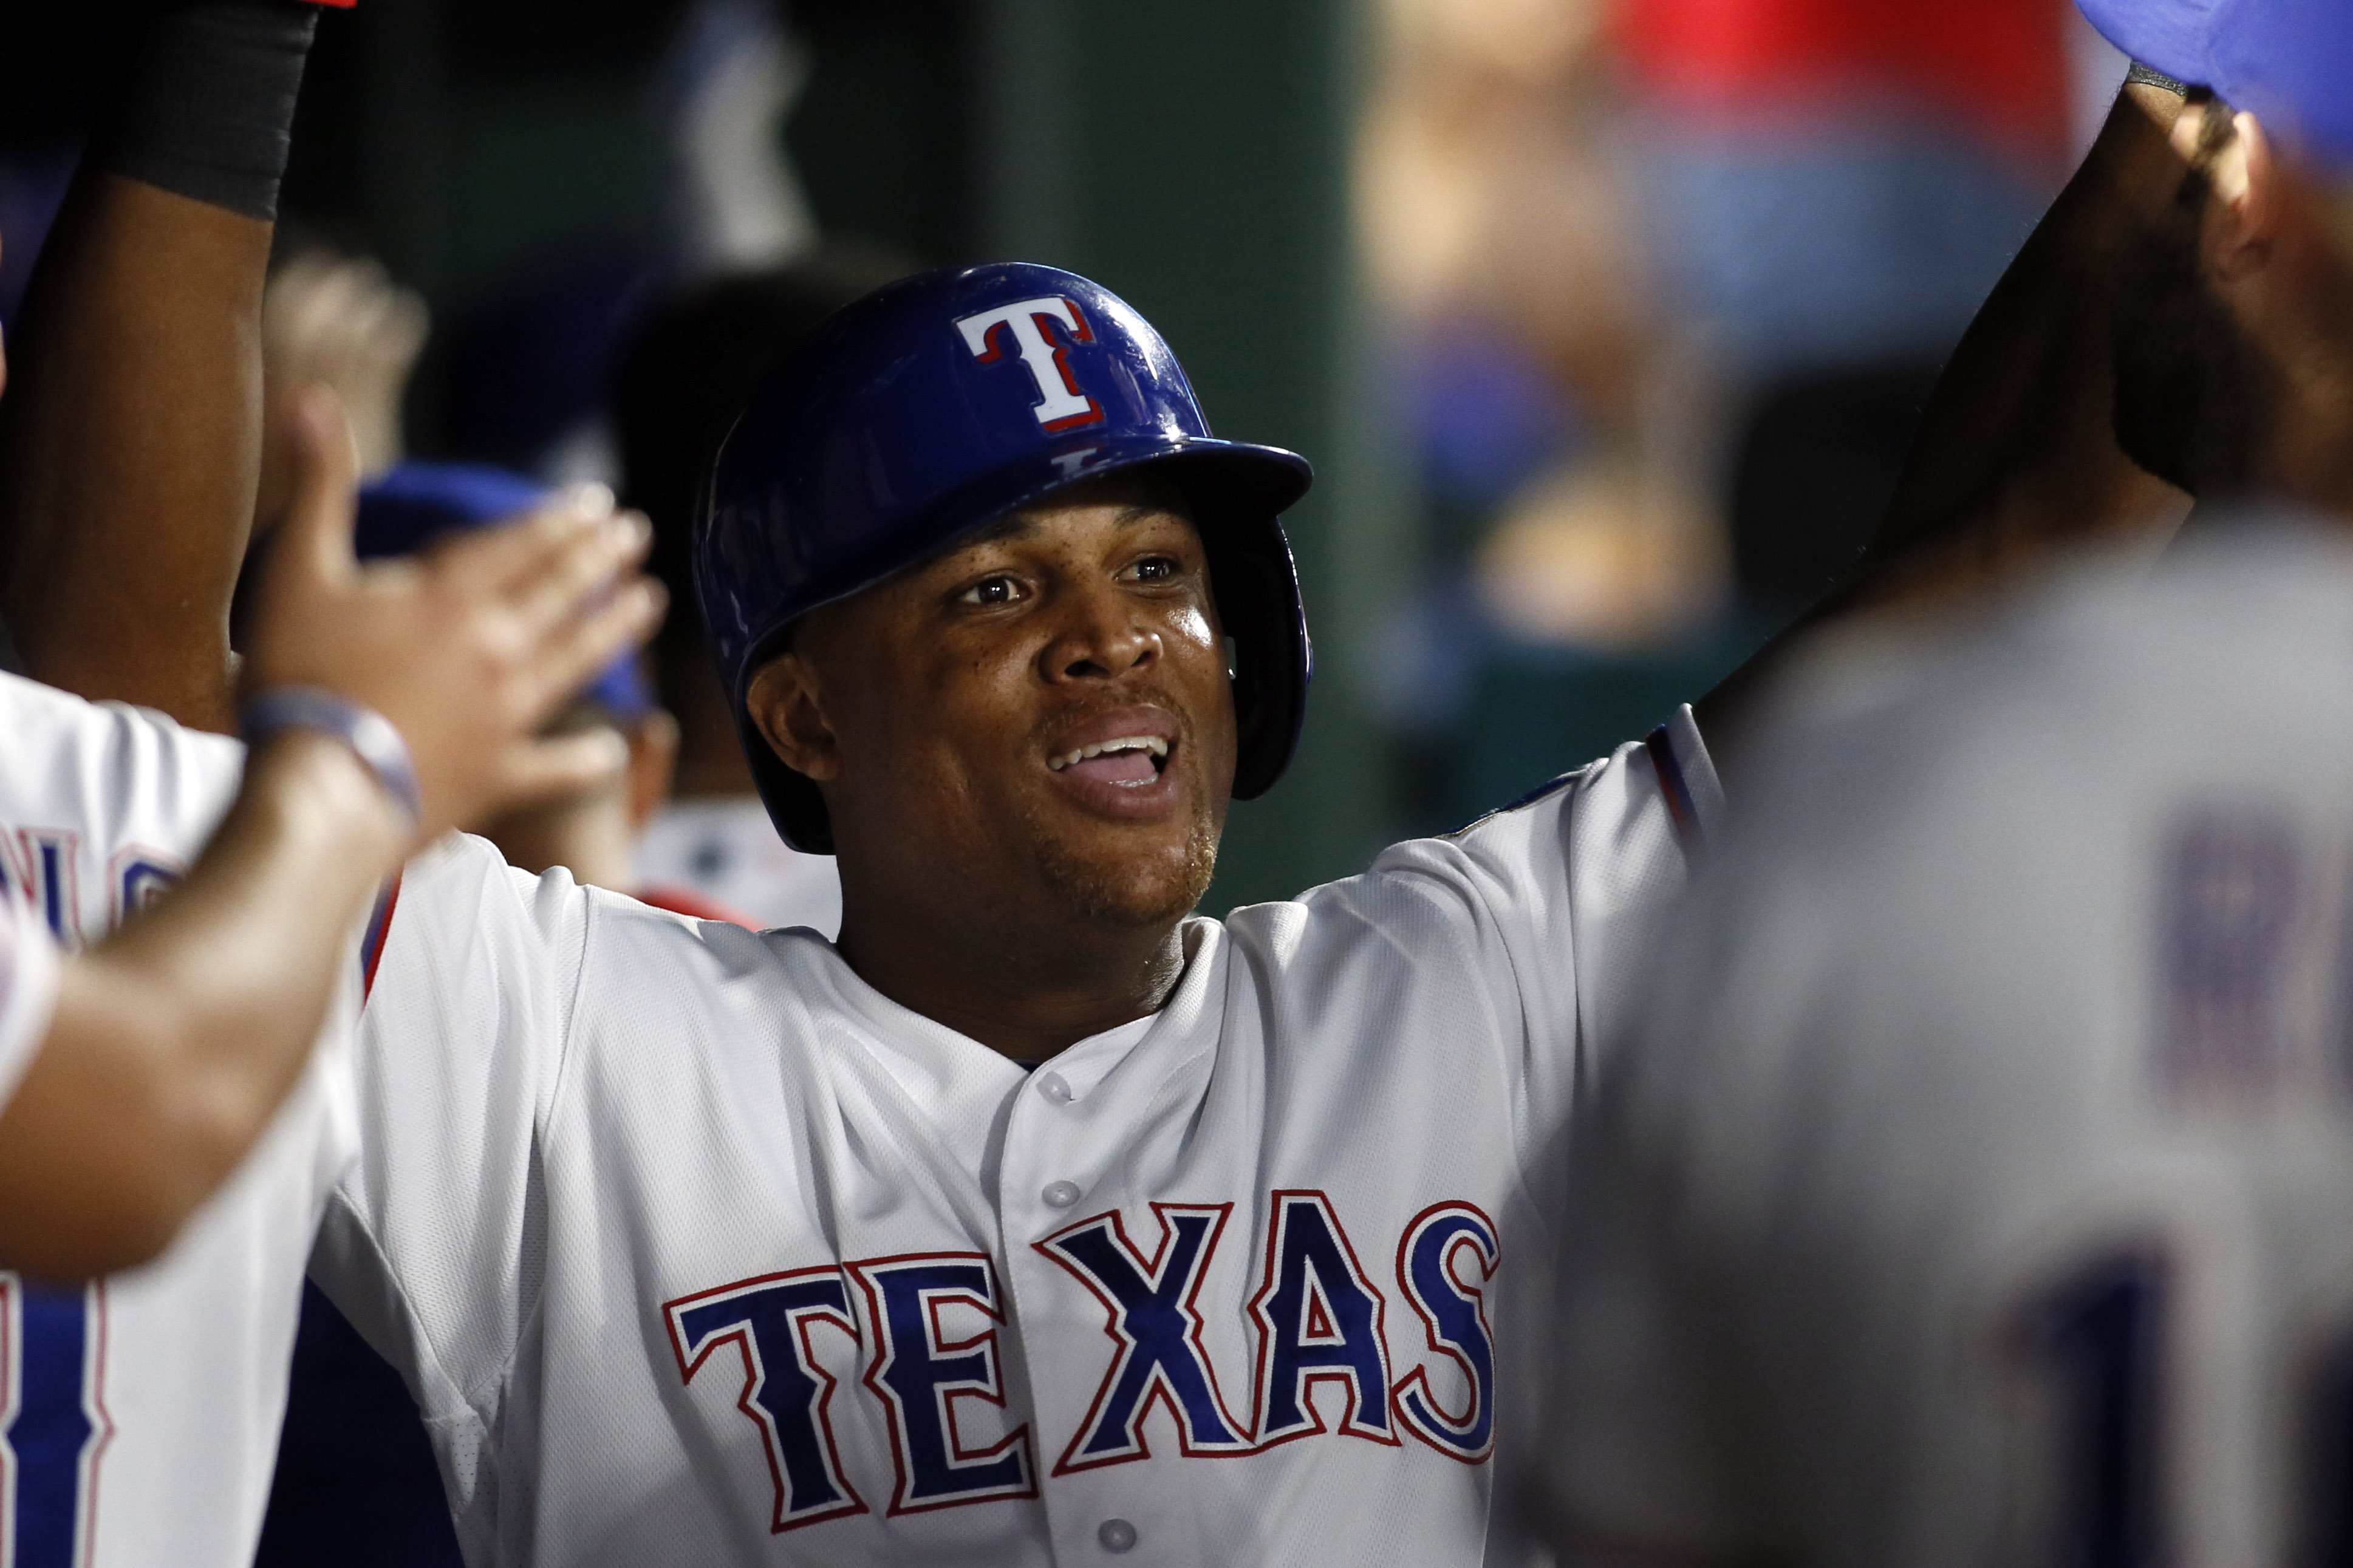 MLB: Milwaukee Brewers at Texas Rangers